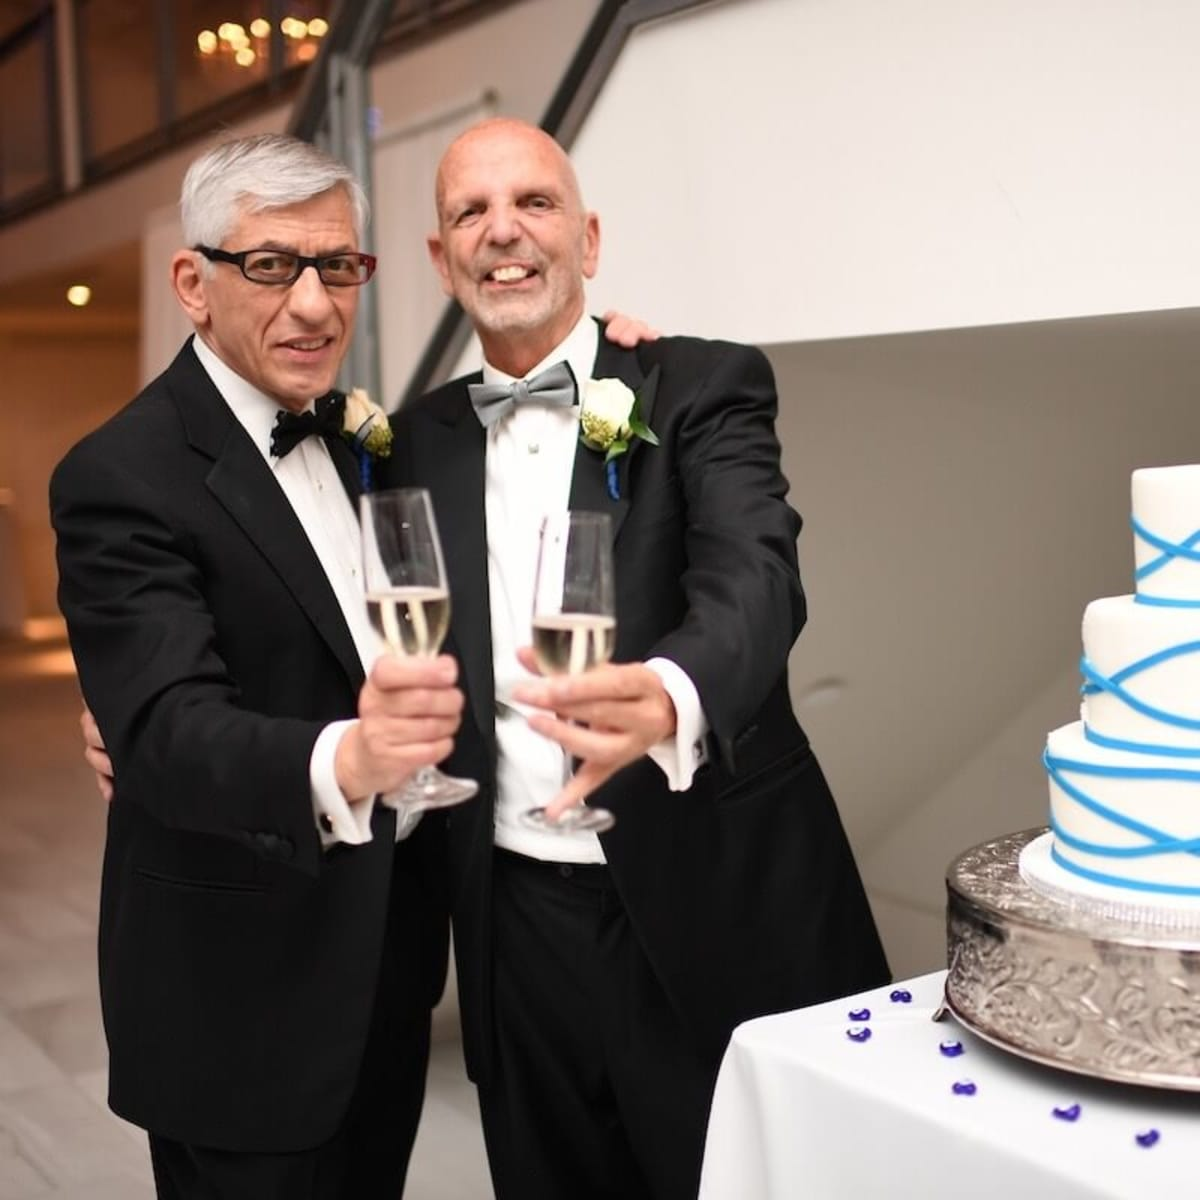 Wedding Pugh Dascoulias champagne toast